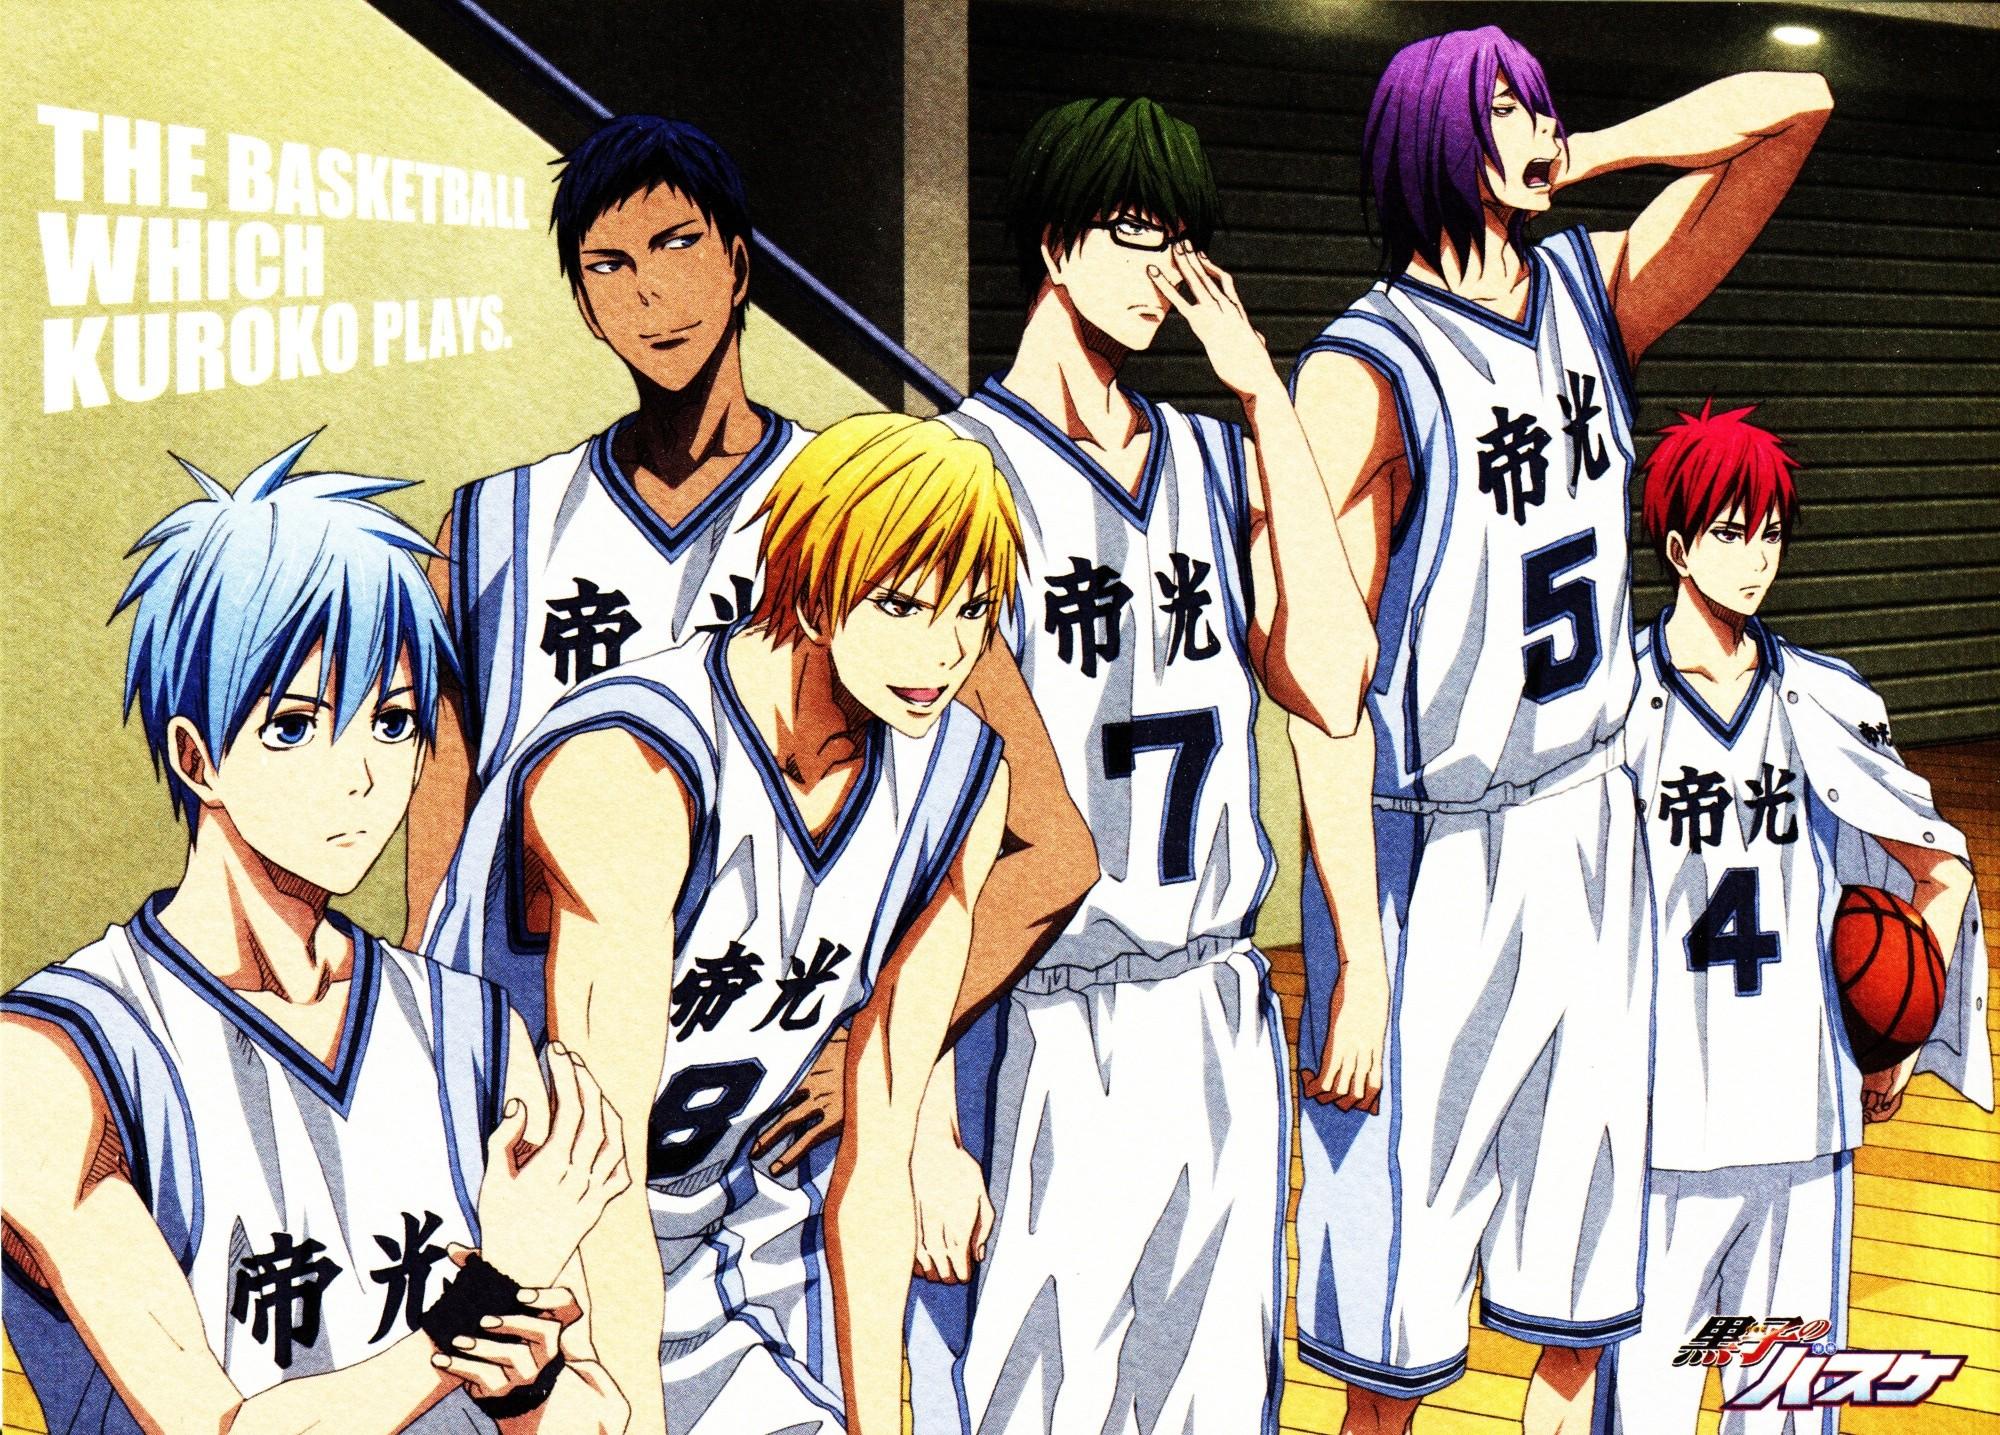 Kuroko's Basketball Characters 13 Wide Wallpaper. Kuroko's Basketball  Characters 13 Wide Wallpaper